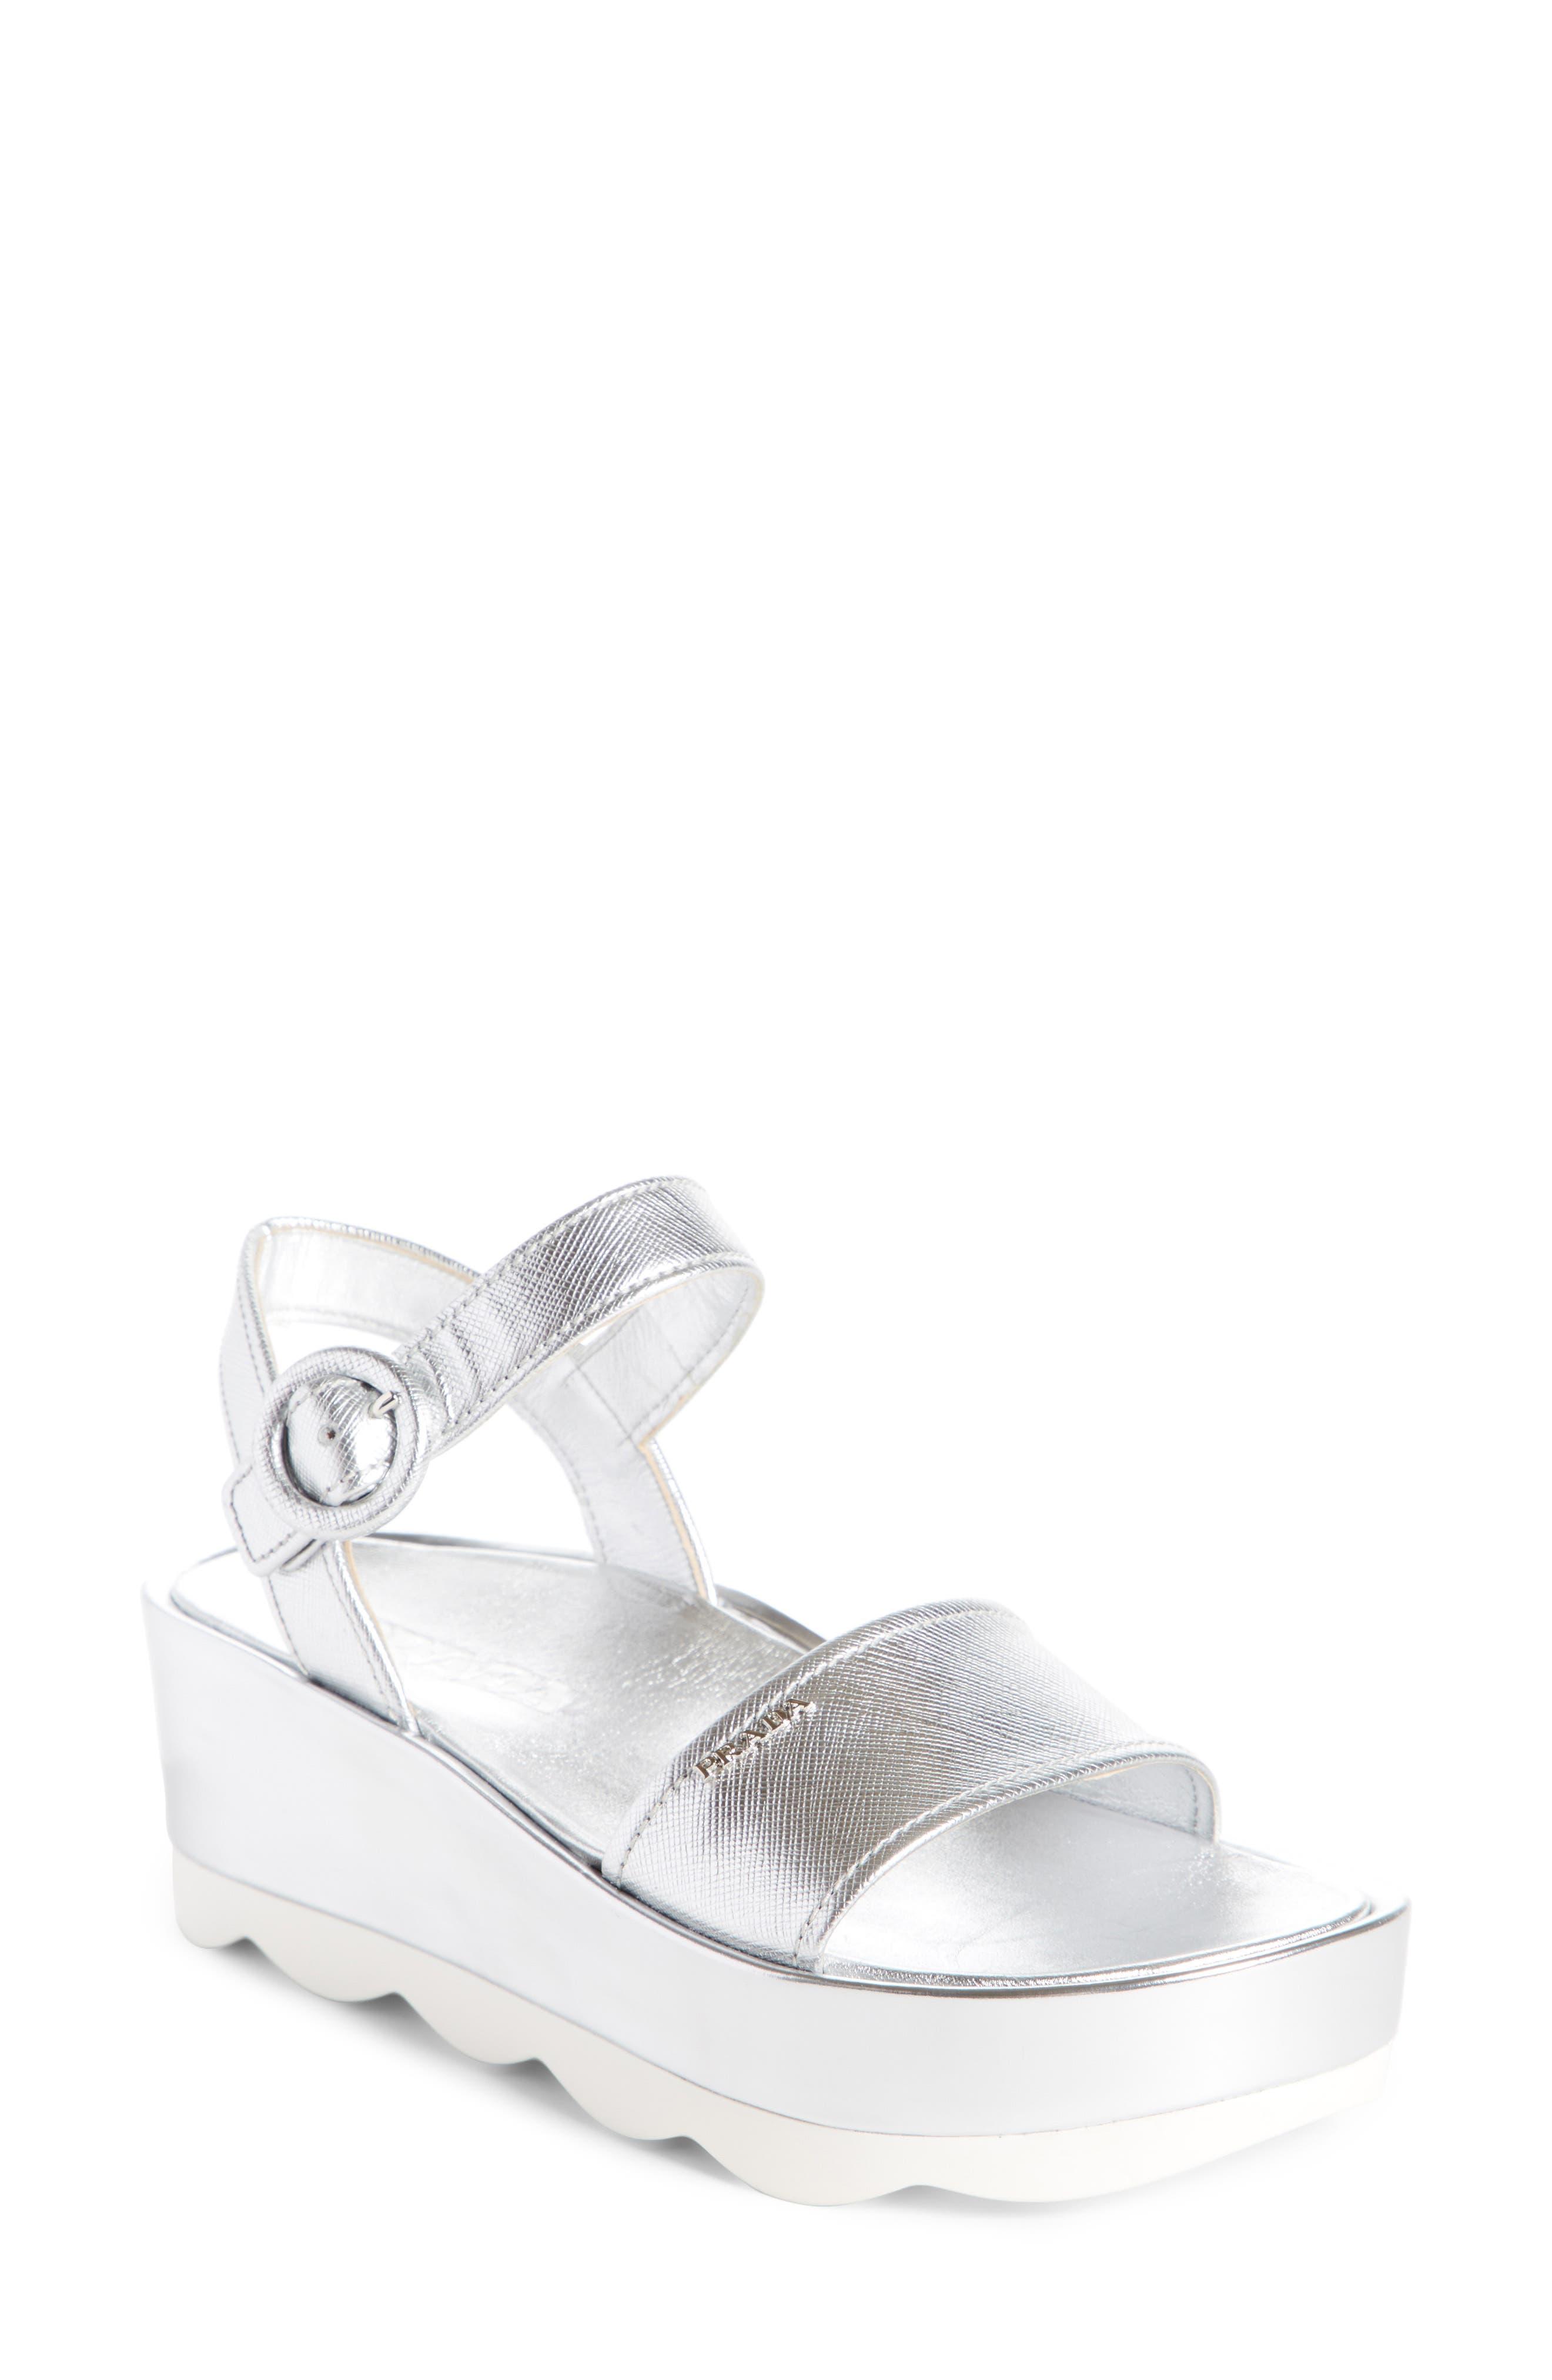 Alternate Image 1 Selected - Prada Ankle Strap Platform Sandal (Women)